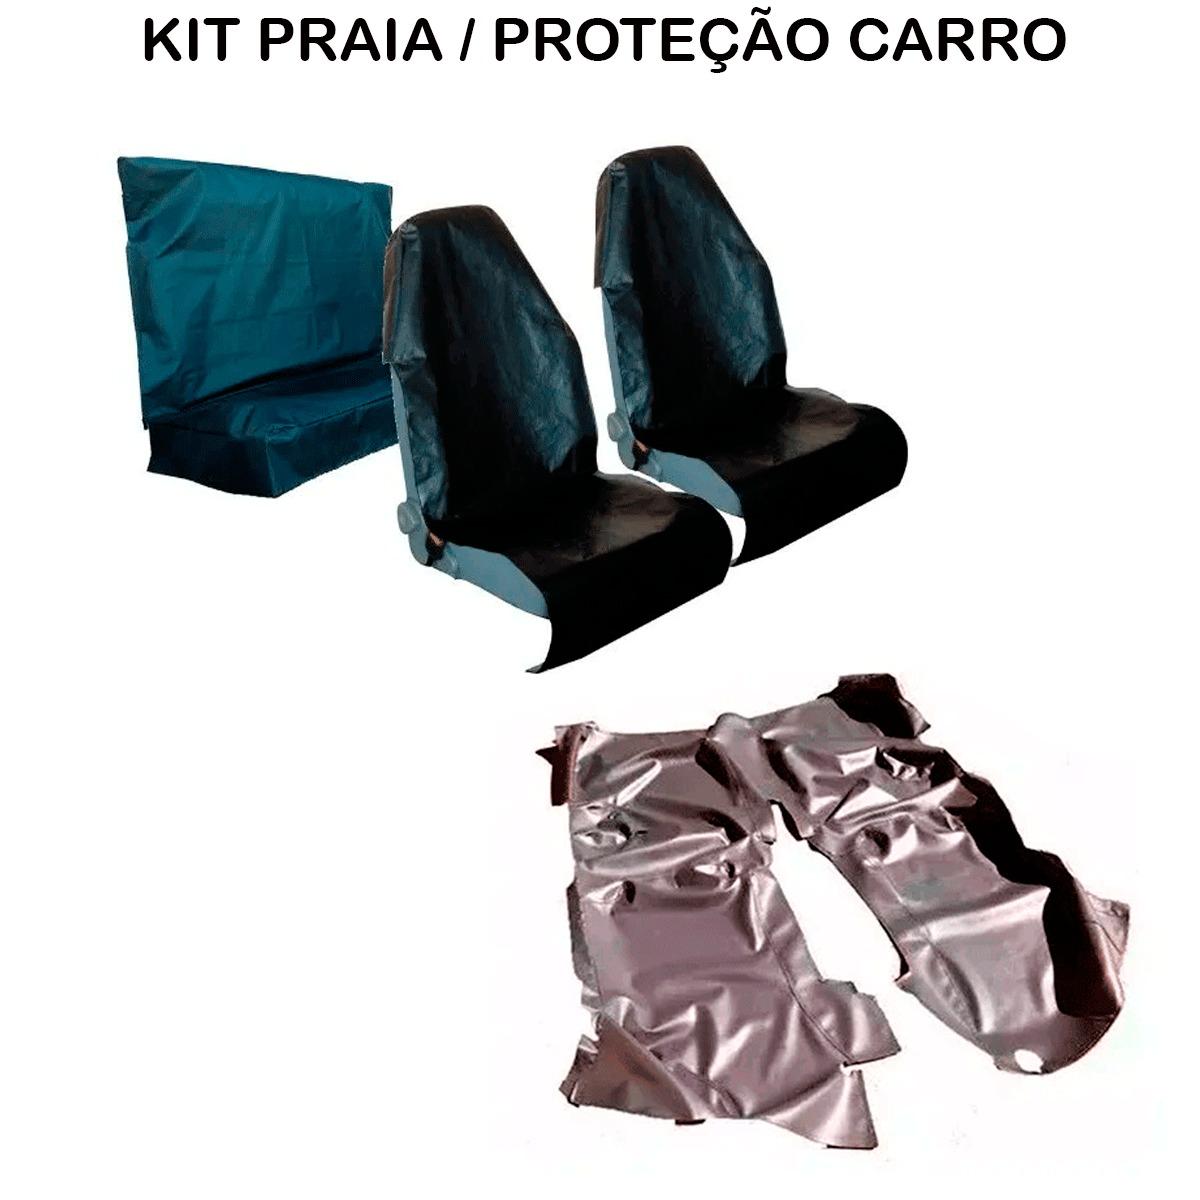 Tapete Em Vinil Fiat Uno 99 a 2003 + Capa Banco Protecao Banco Areia Suor Academia